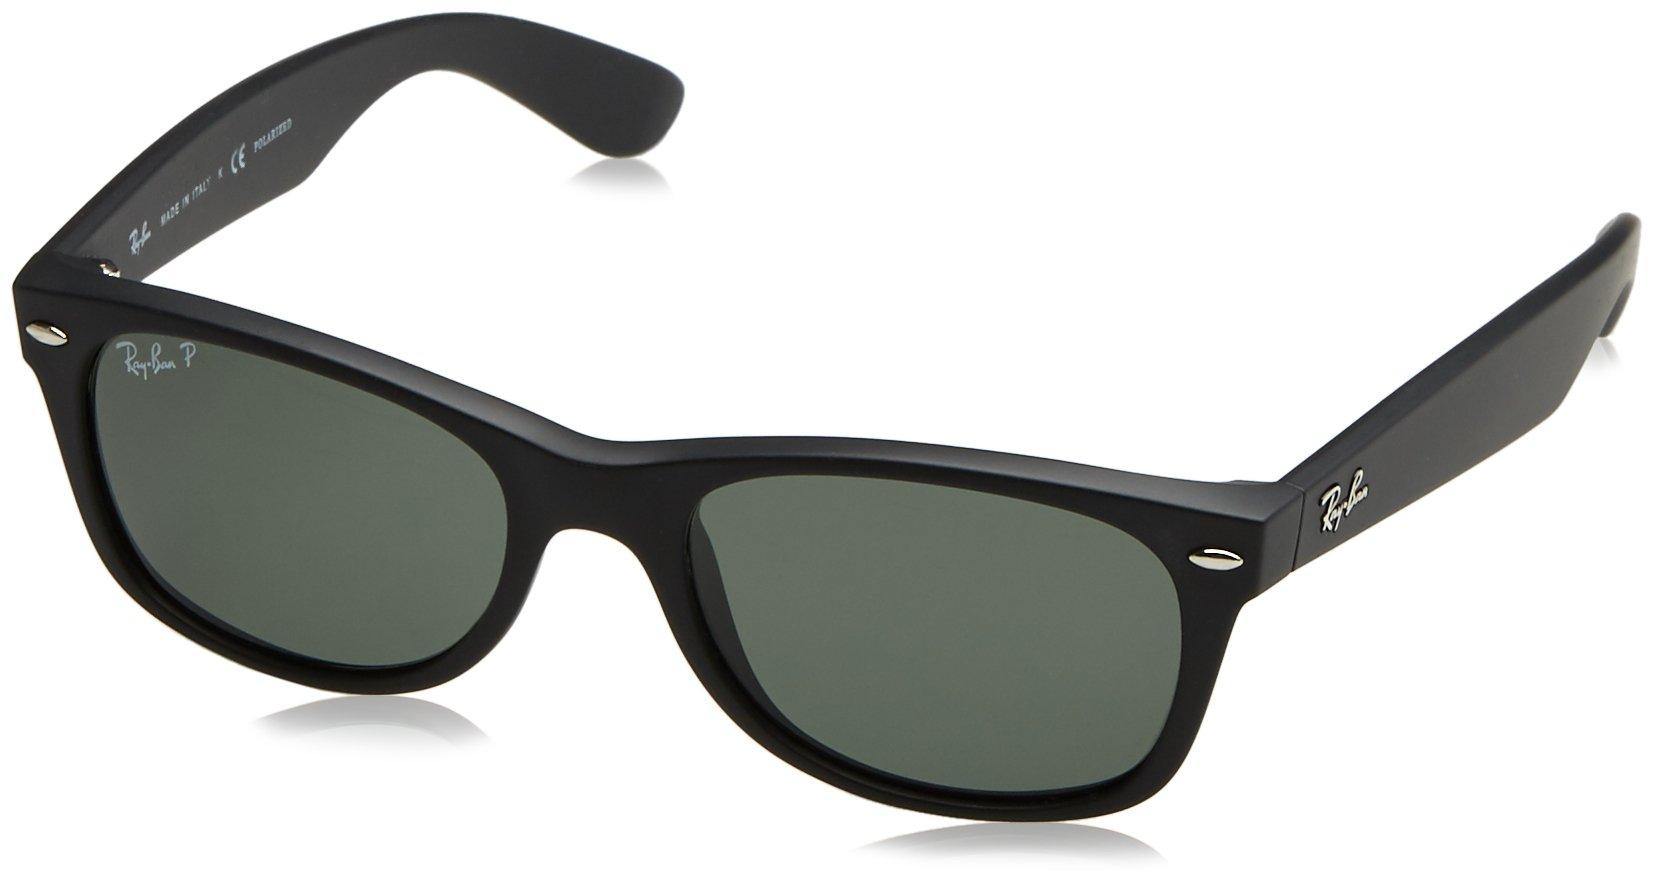 Ray-Ban New Wayfarer Classic, Rubber Black Frame/Polarized Green Lens